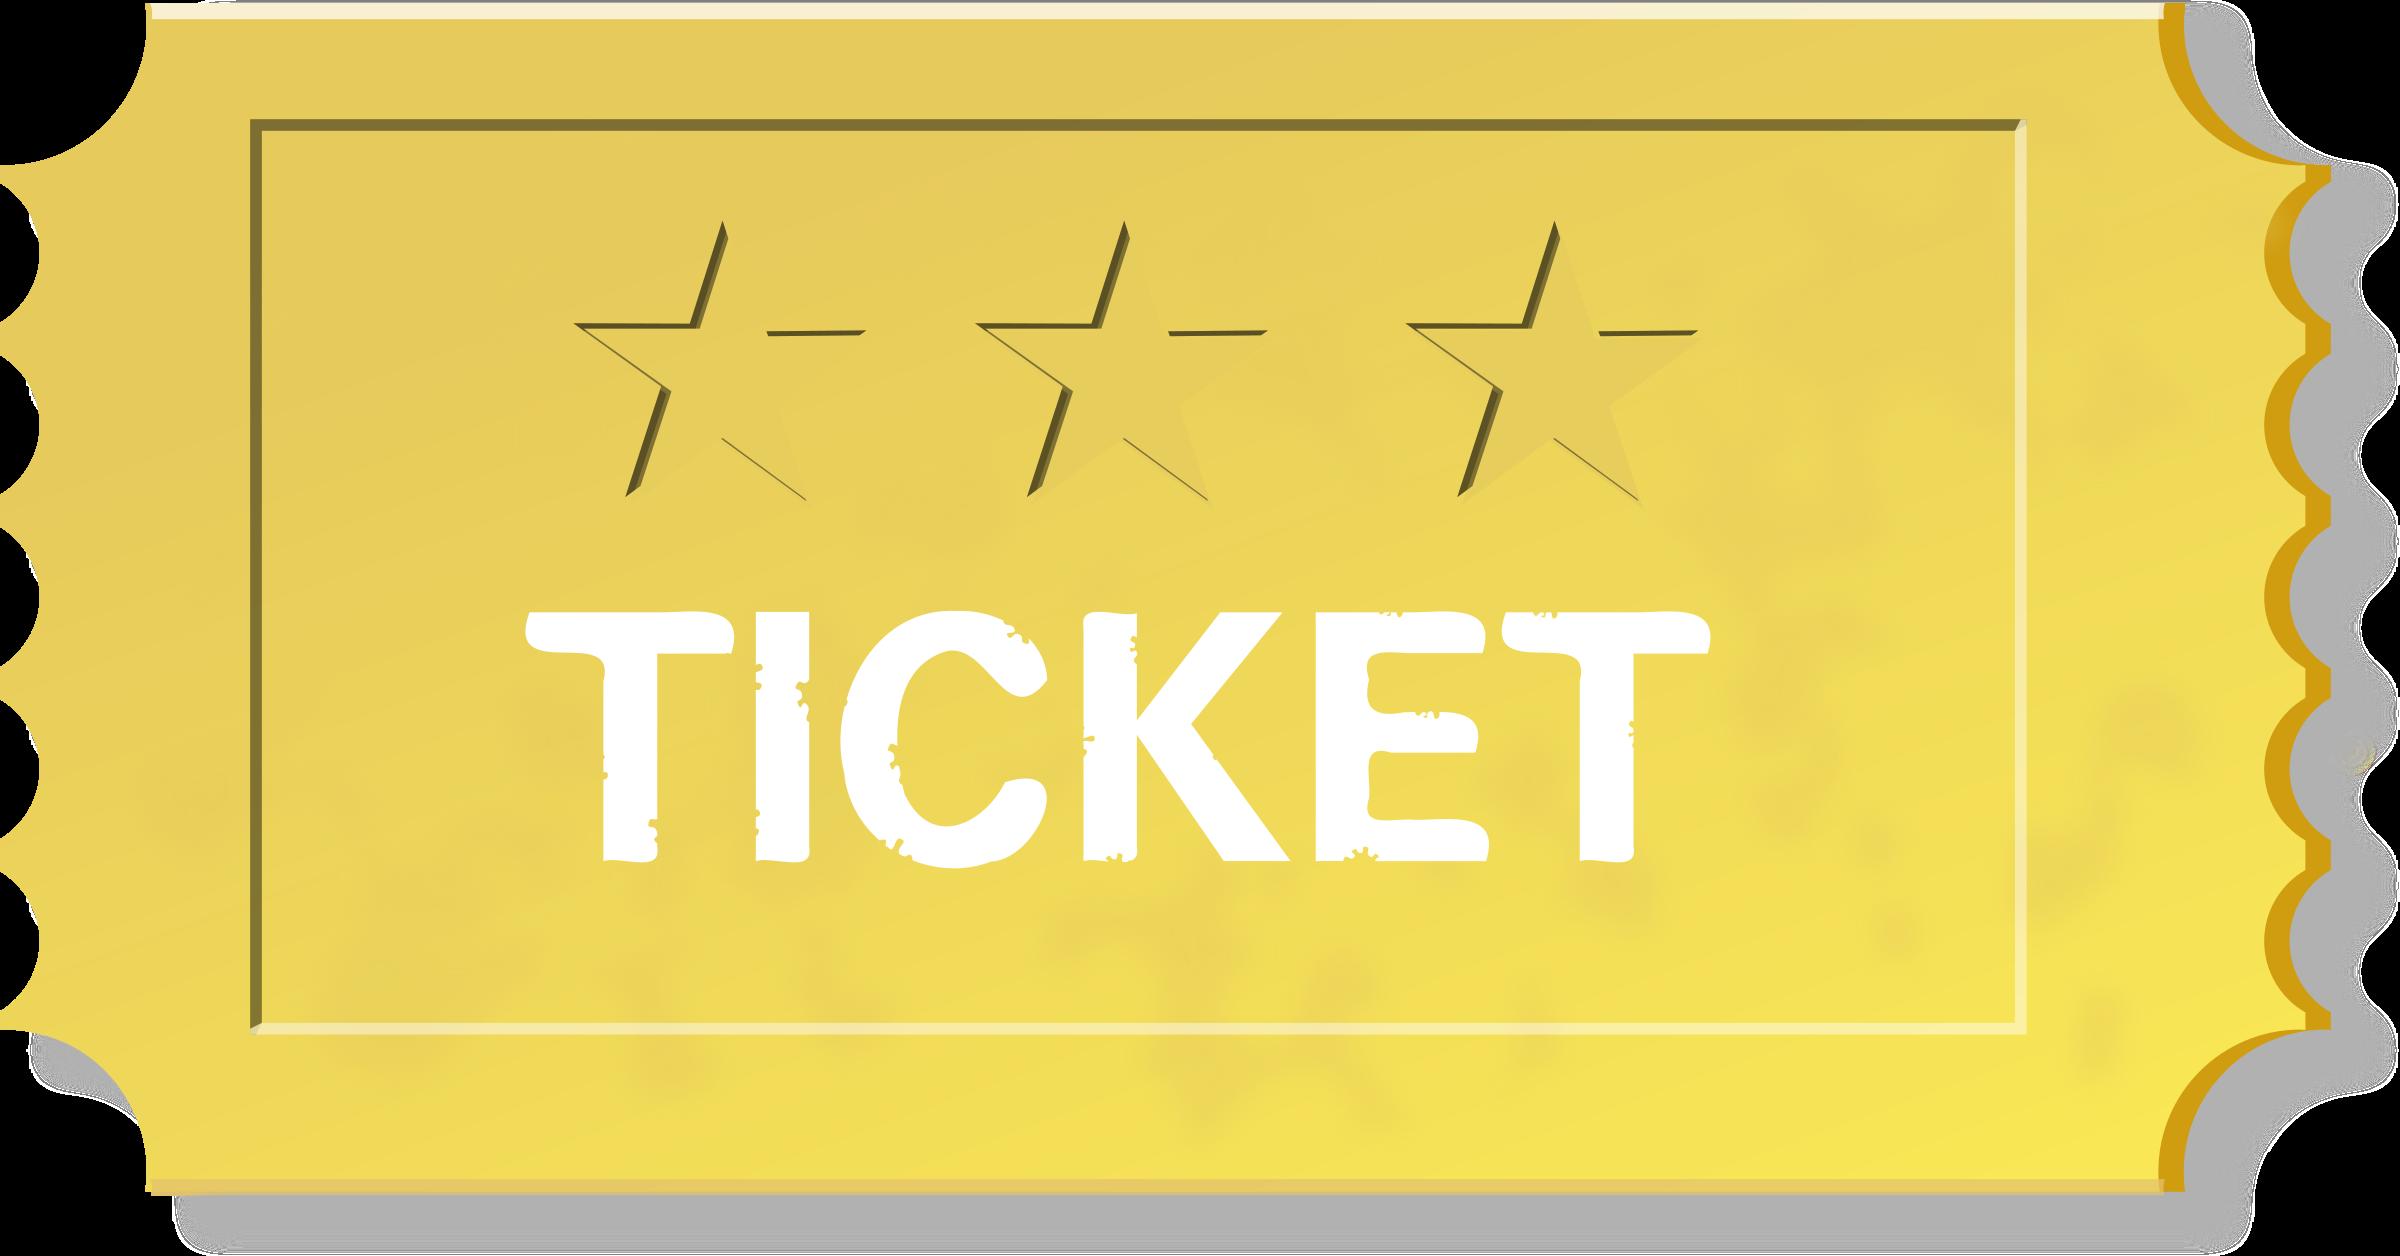 Raffle clipart museum ticket. Jokingart com